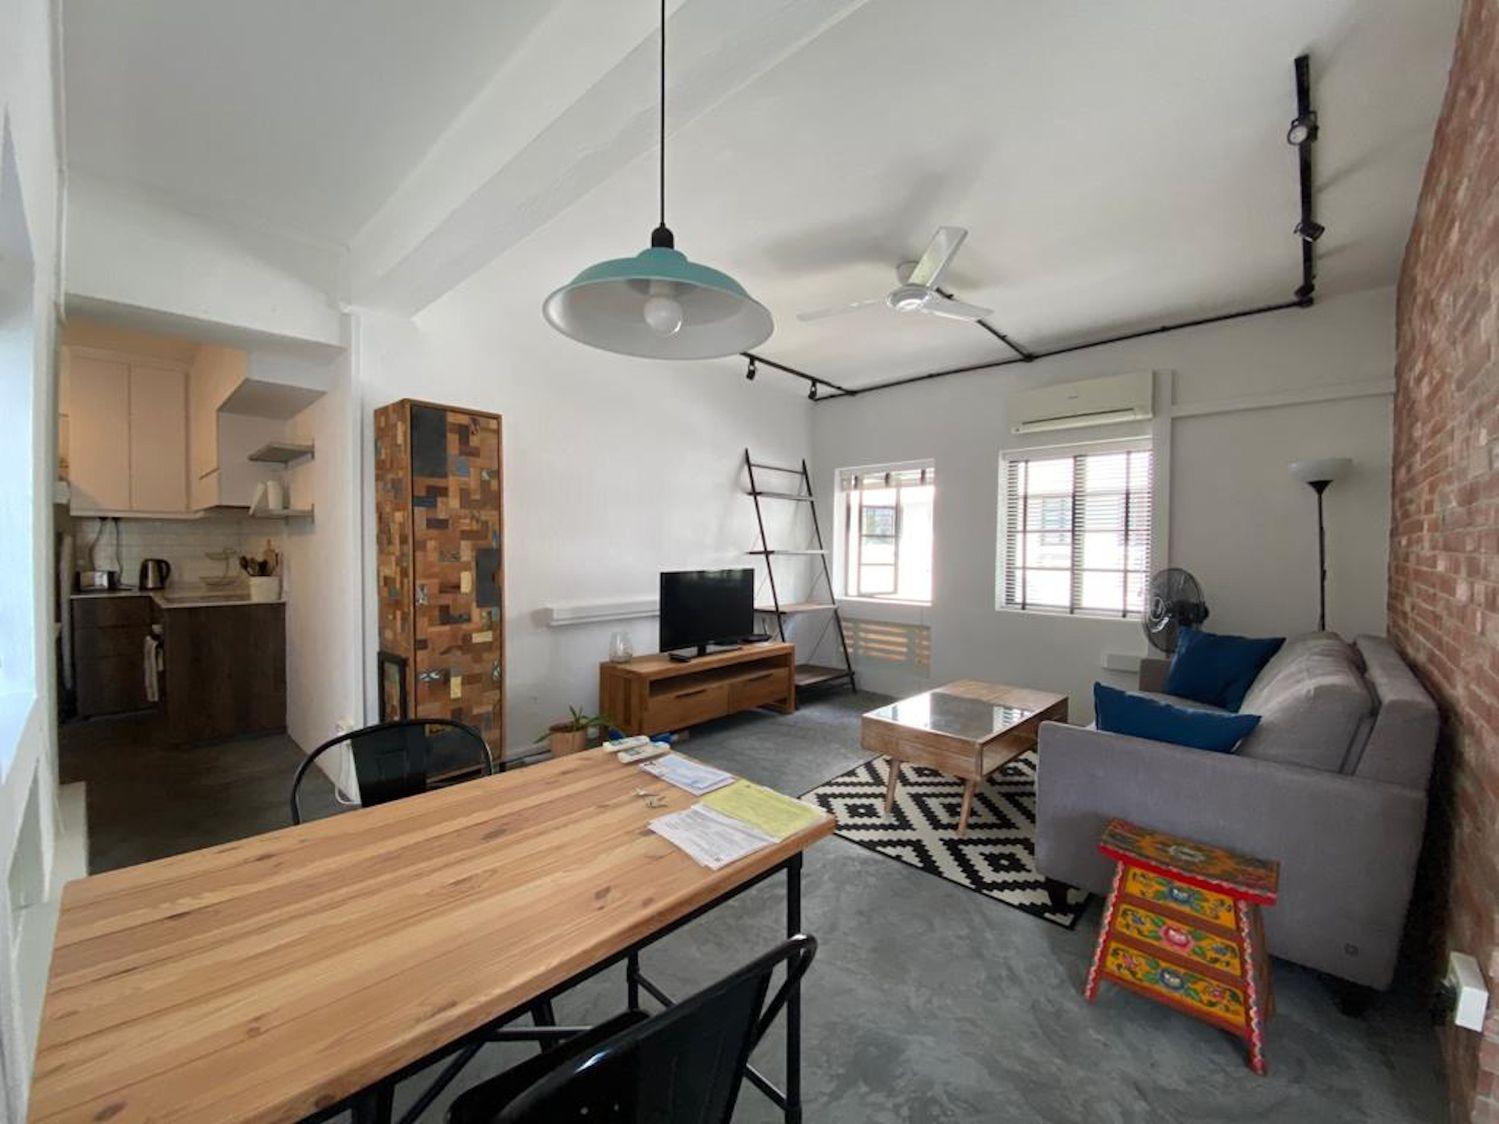 Chay-Yan-flat-living-room-Wiliiam-Tan - EDGEPROP SINGAPORE